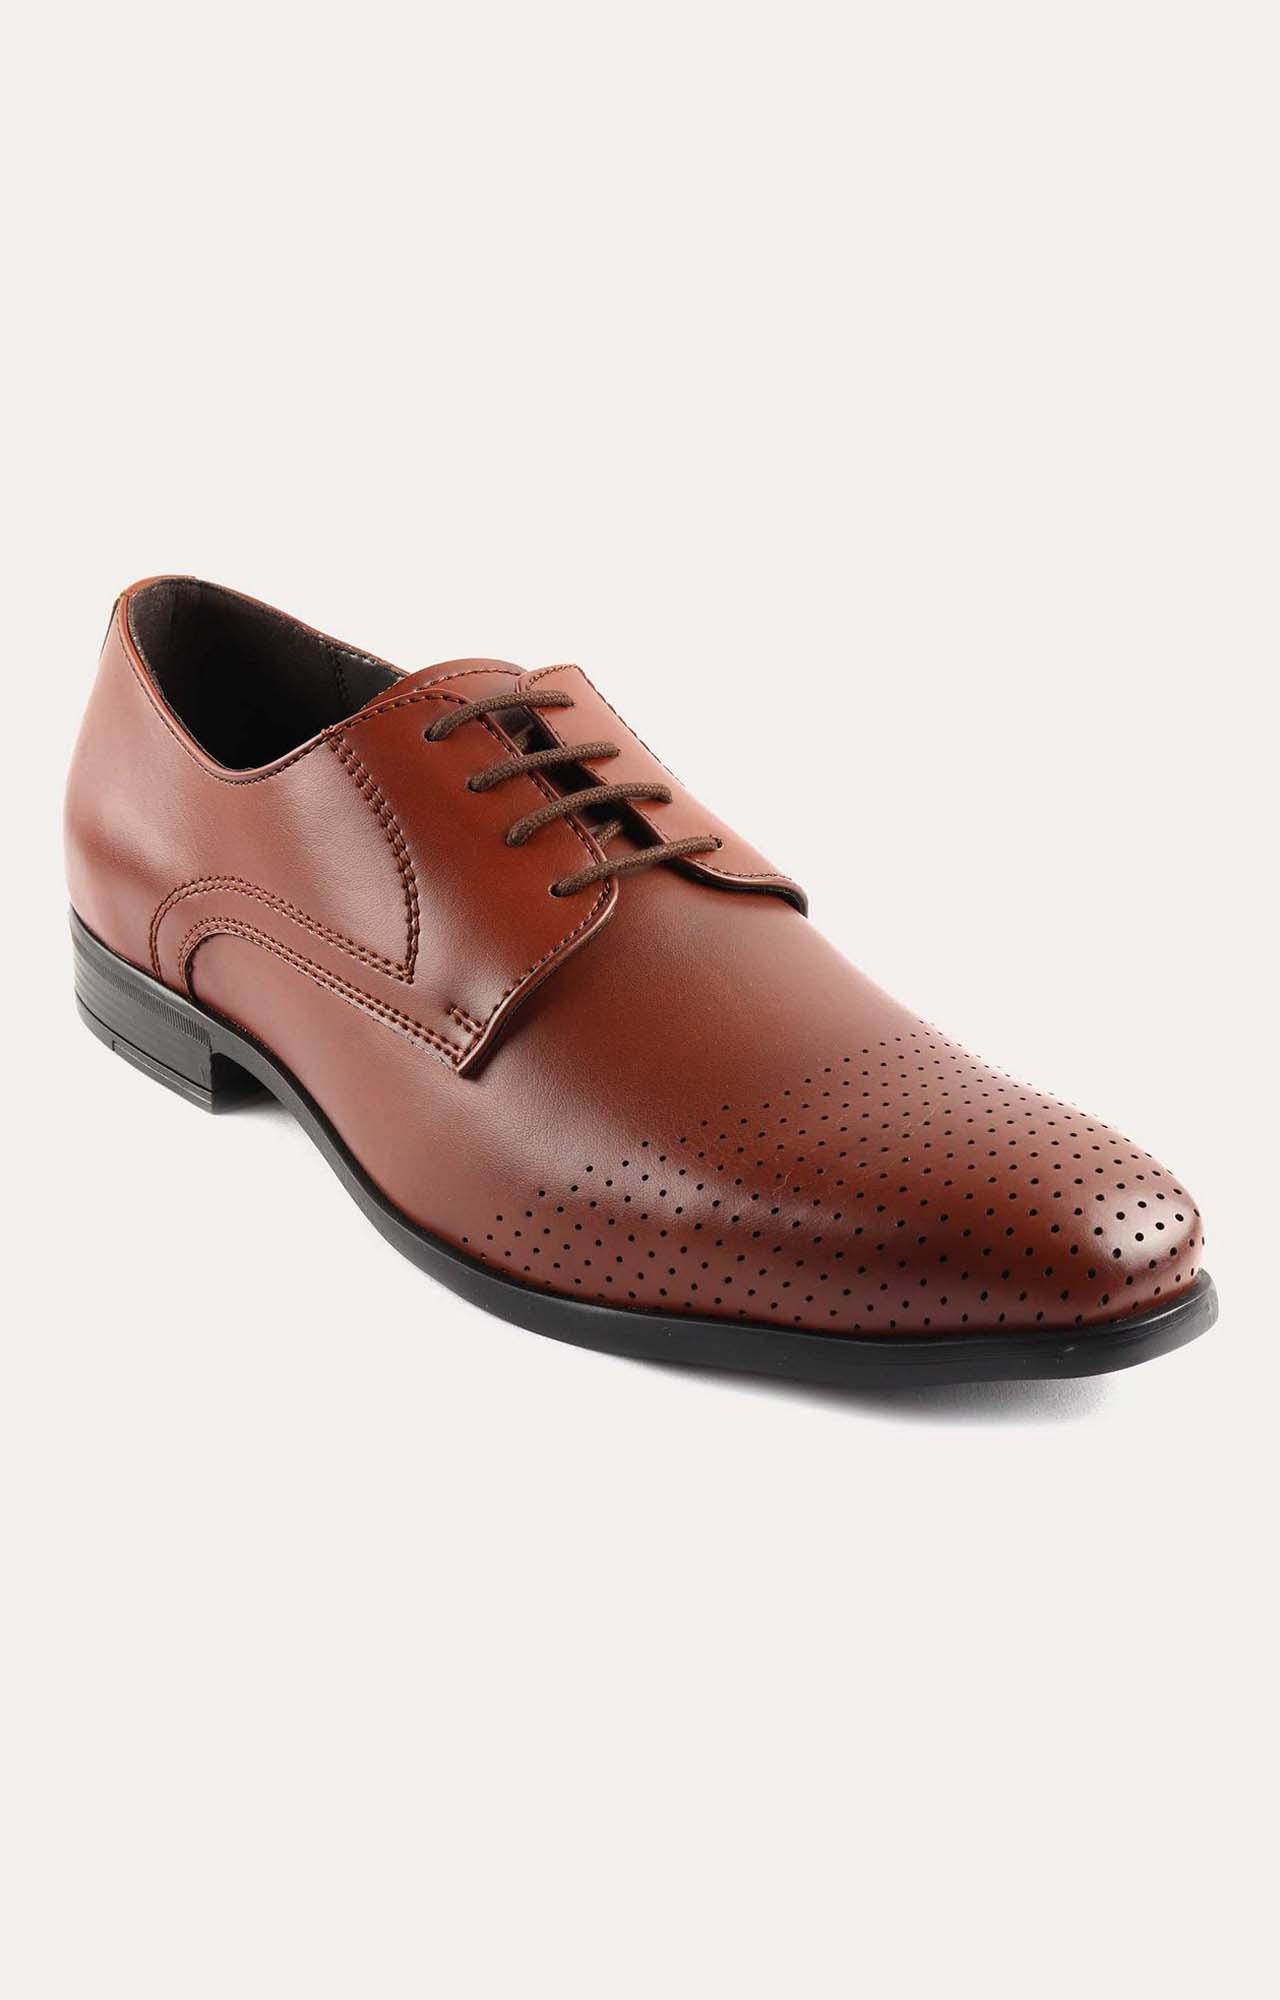 San Frissco | Tan Derby Shoes